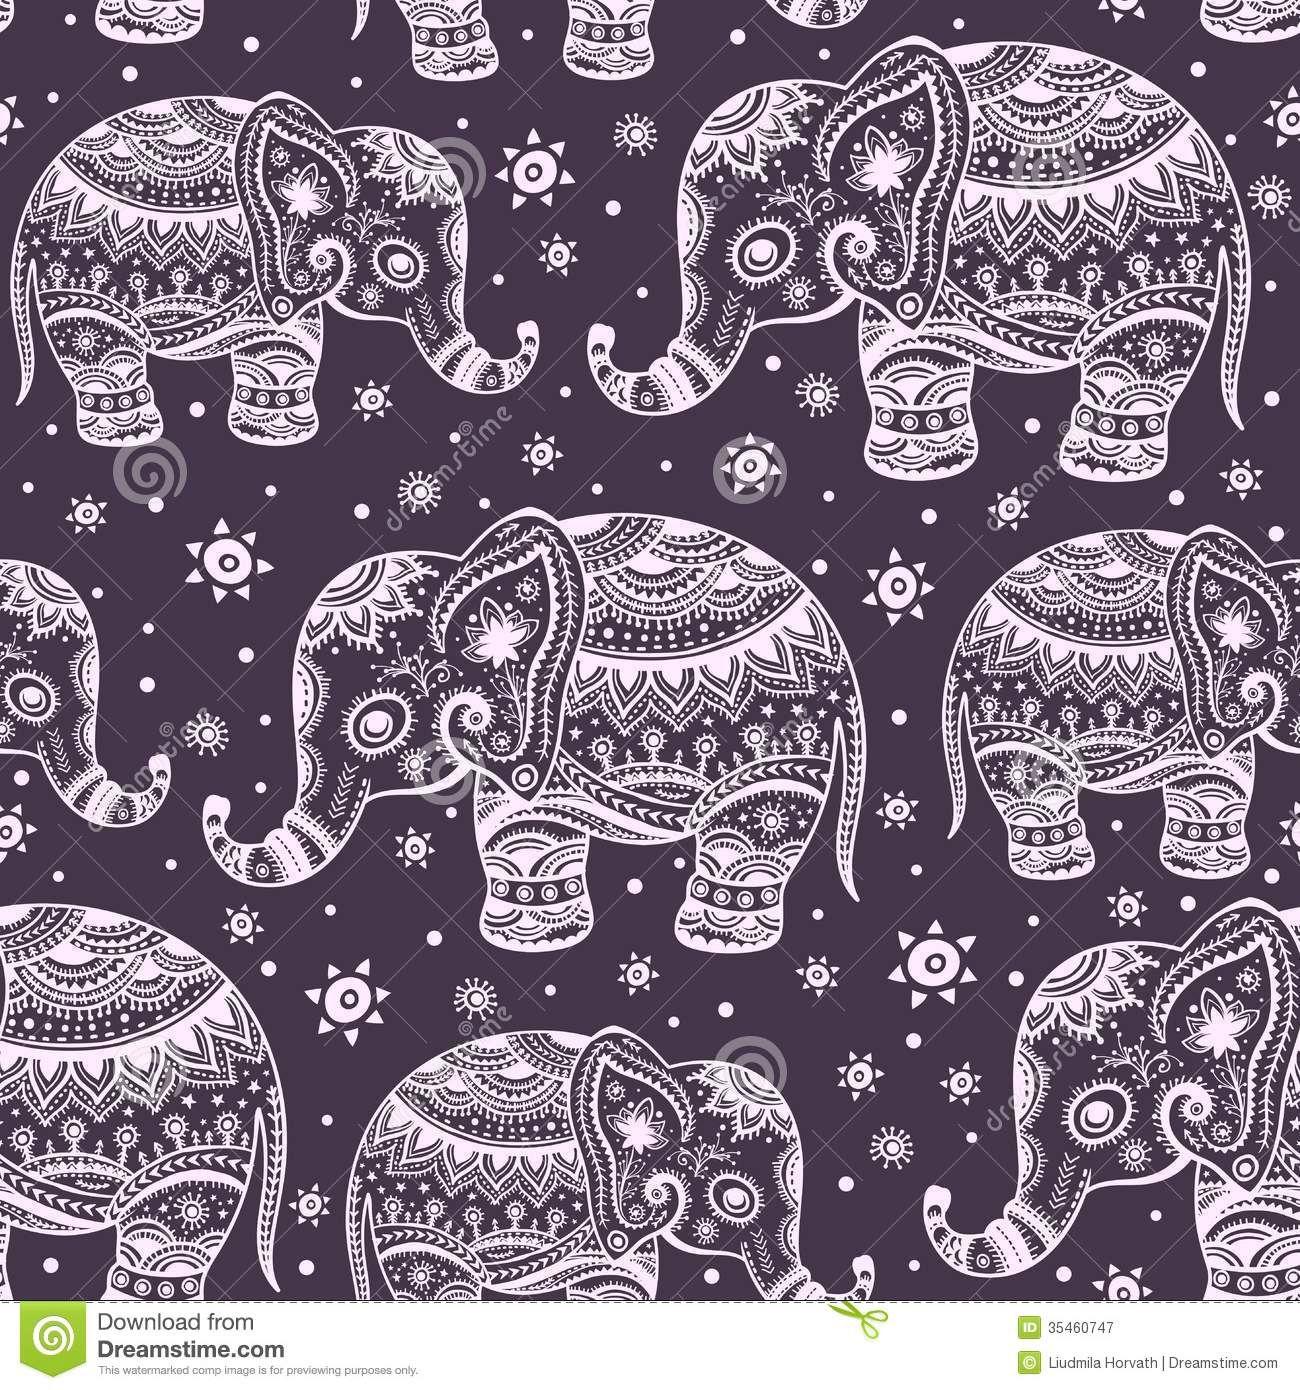 Ethnic iphone wallpaper - Tribal Elephant Wallpaper Tribal Elephant Wallpaper